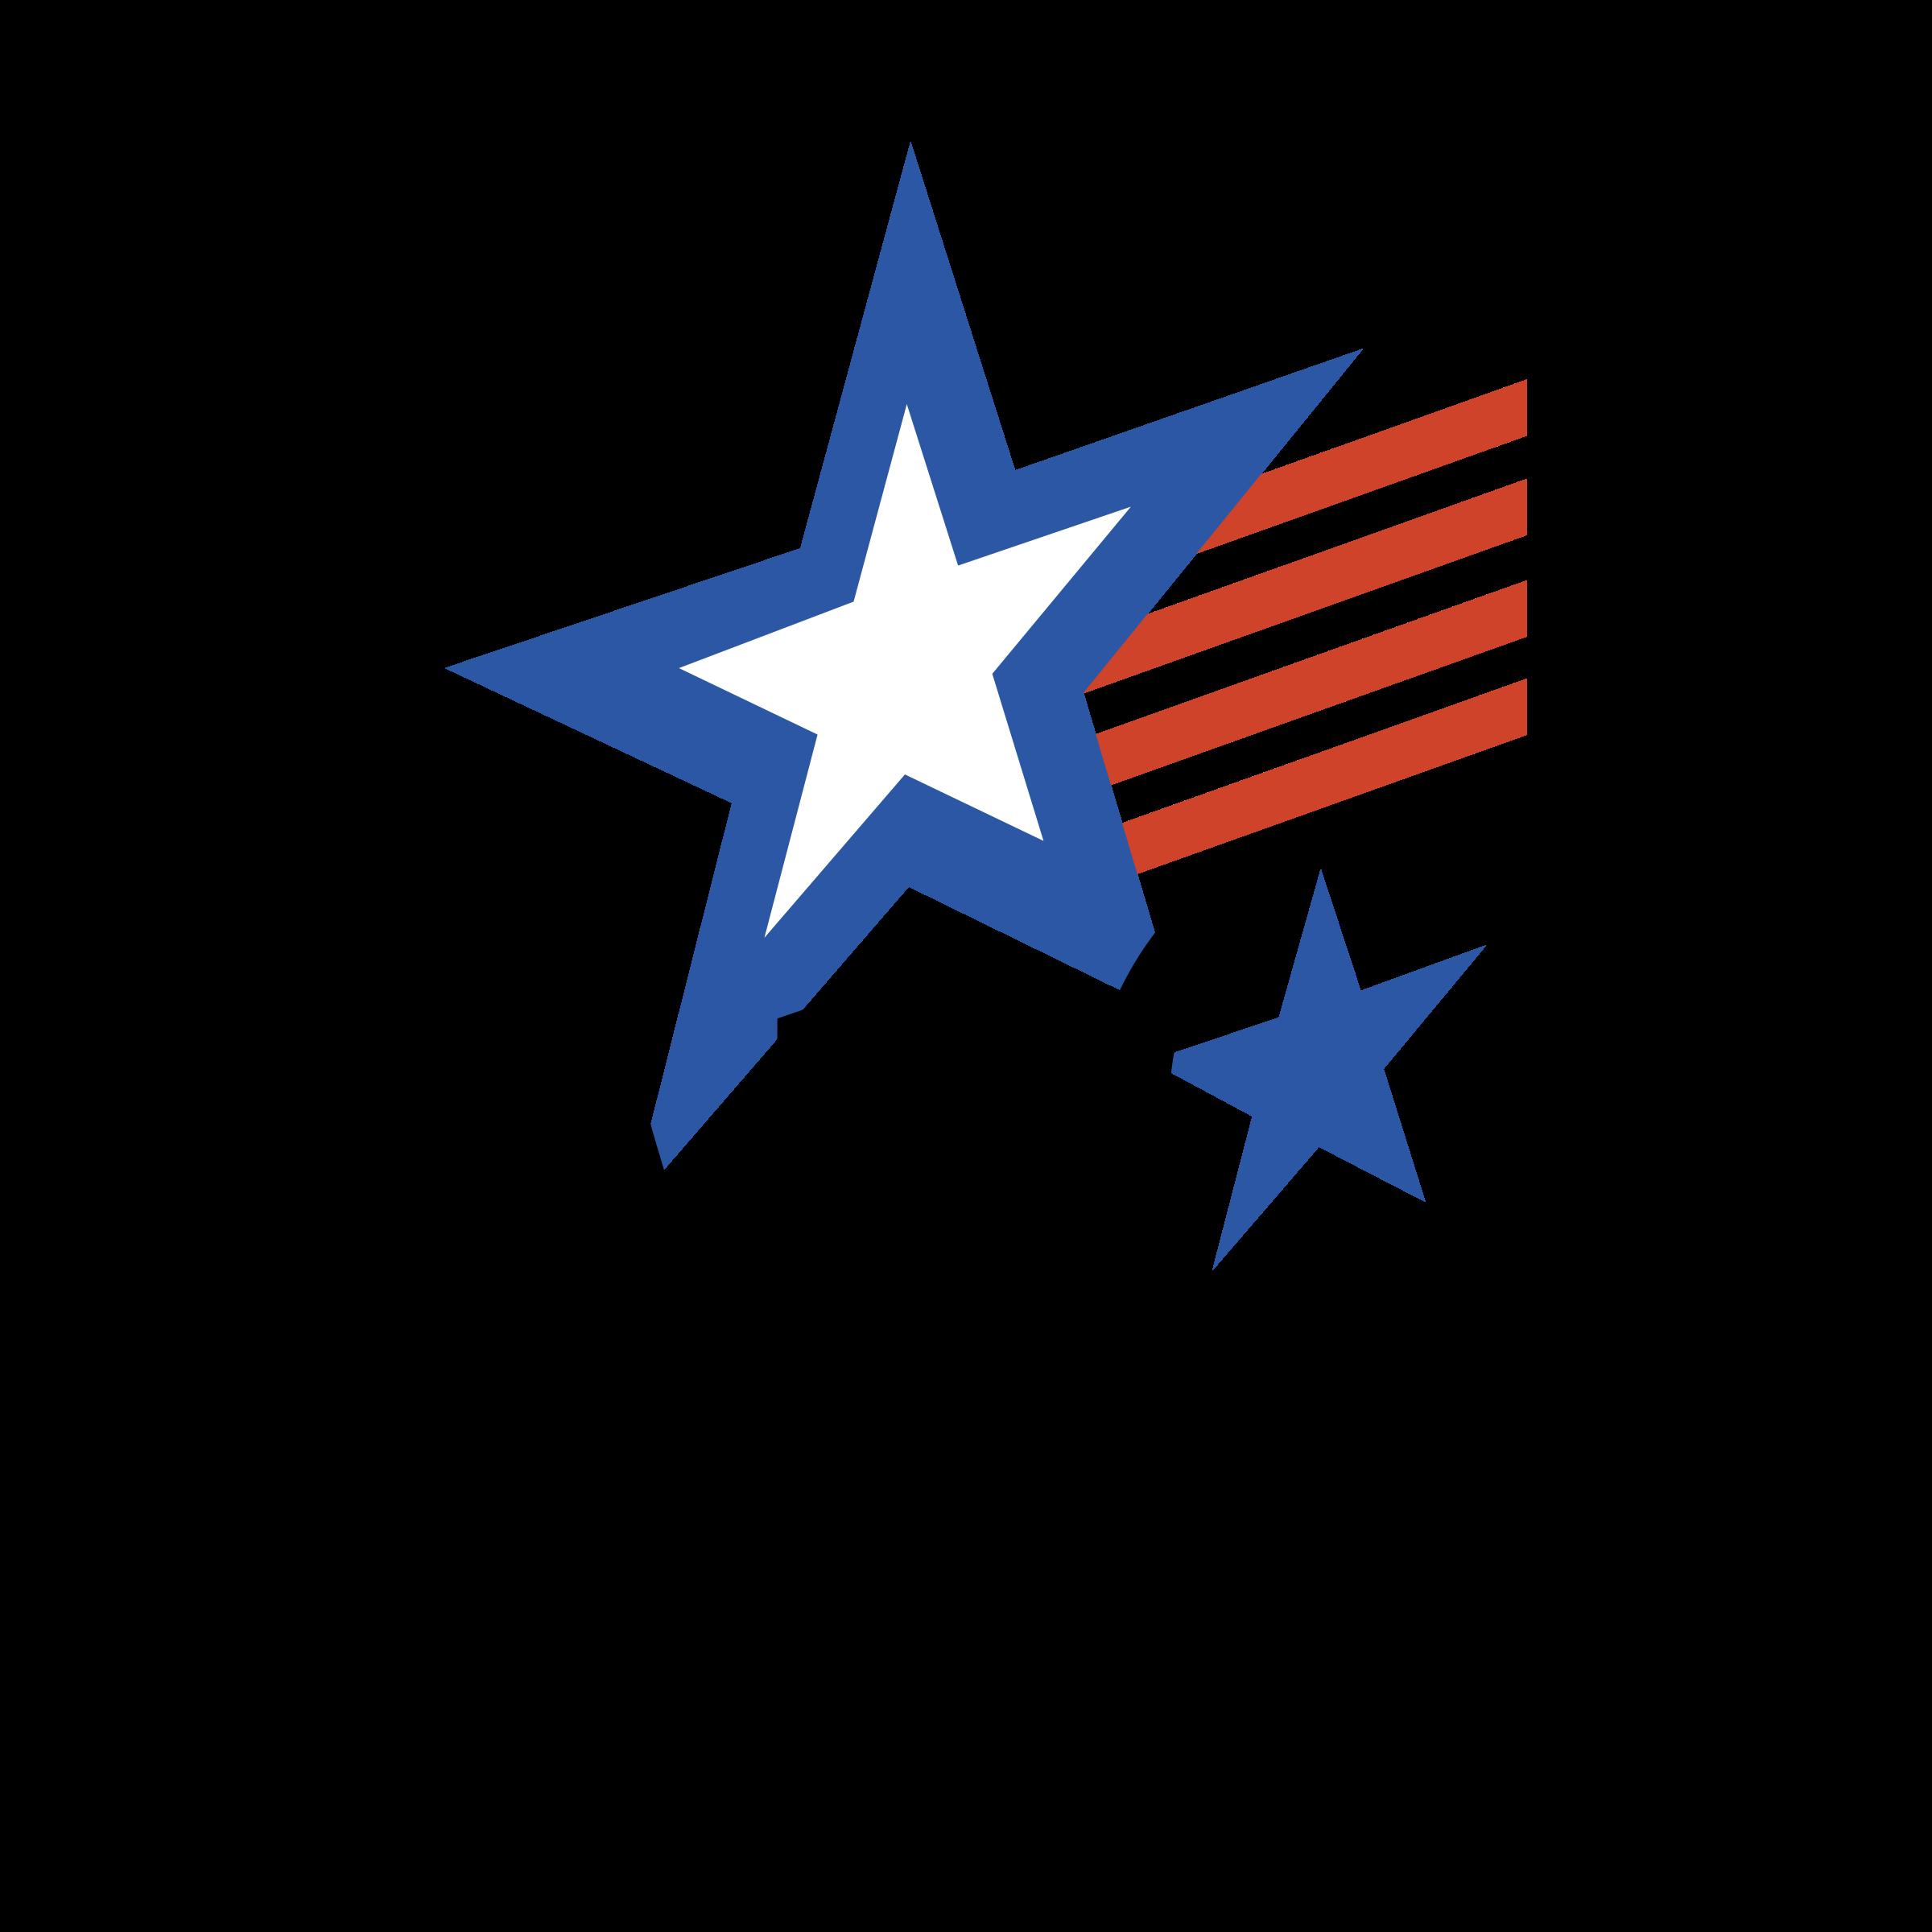 ABC 03 Logo PNG Transparent & SVG Vector.